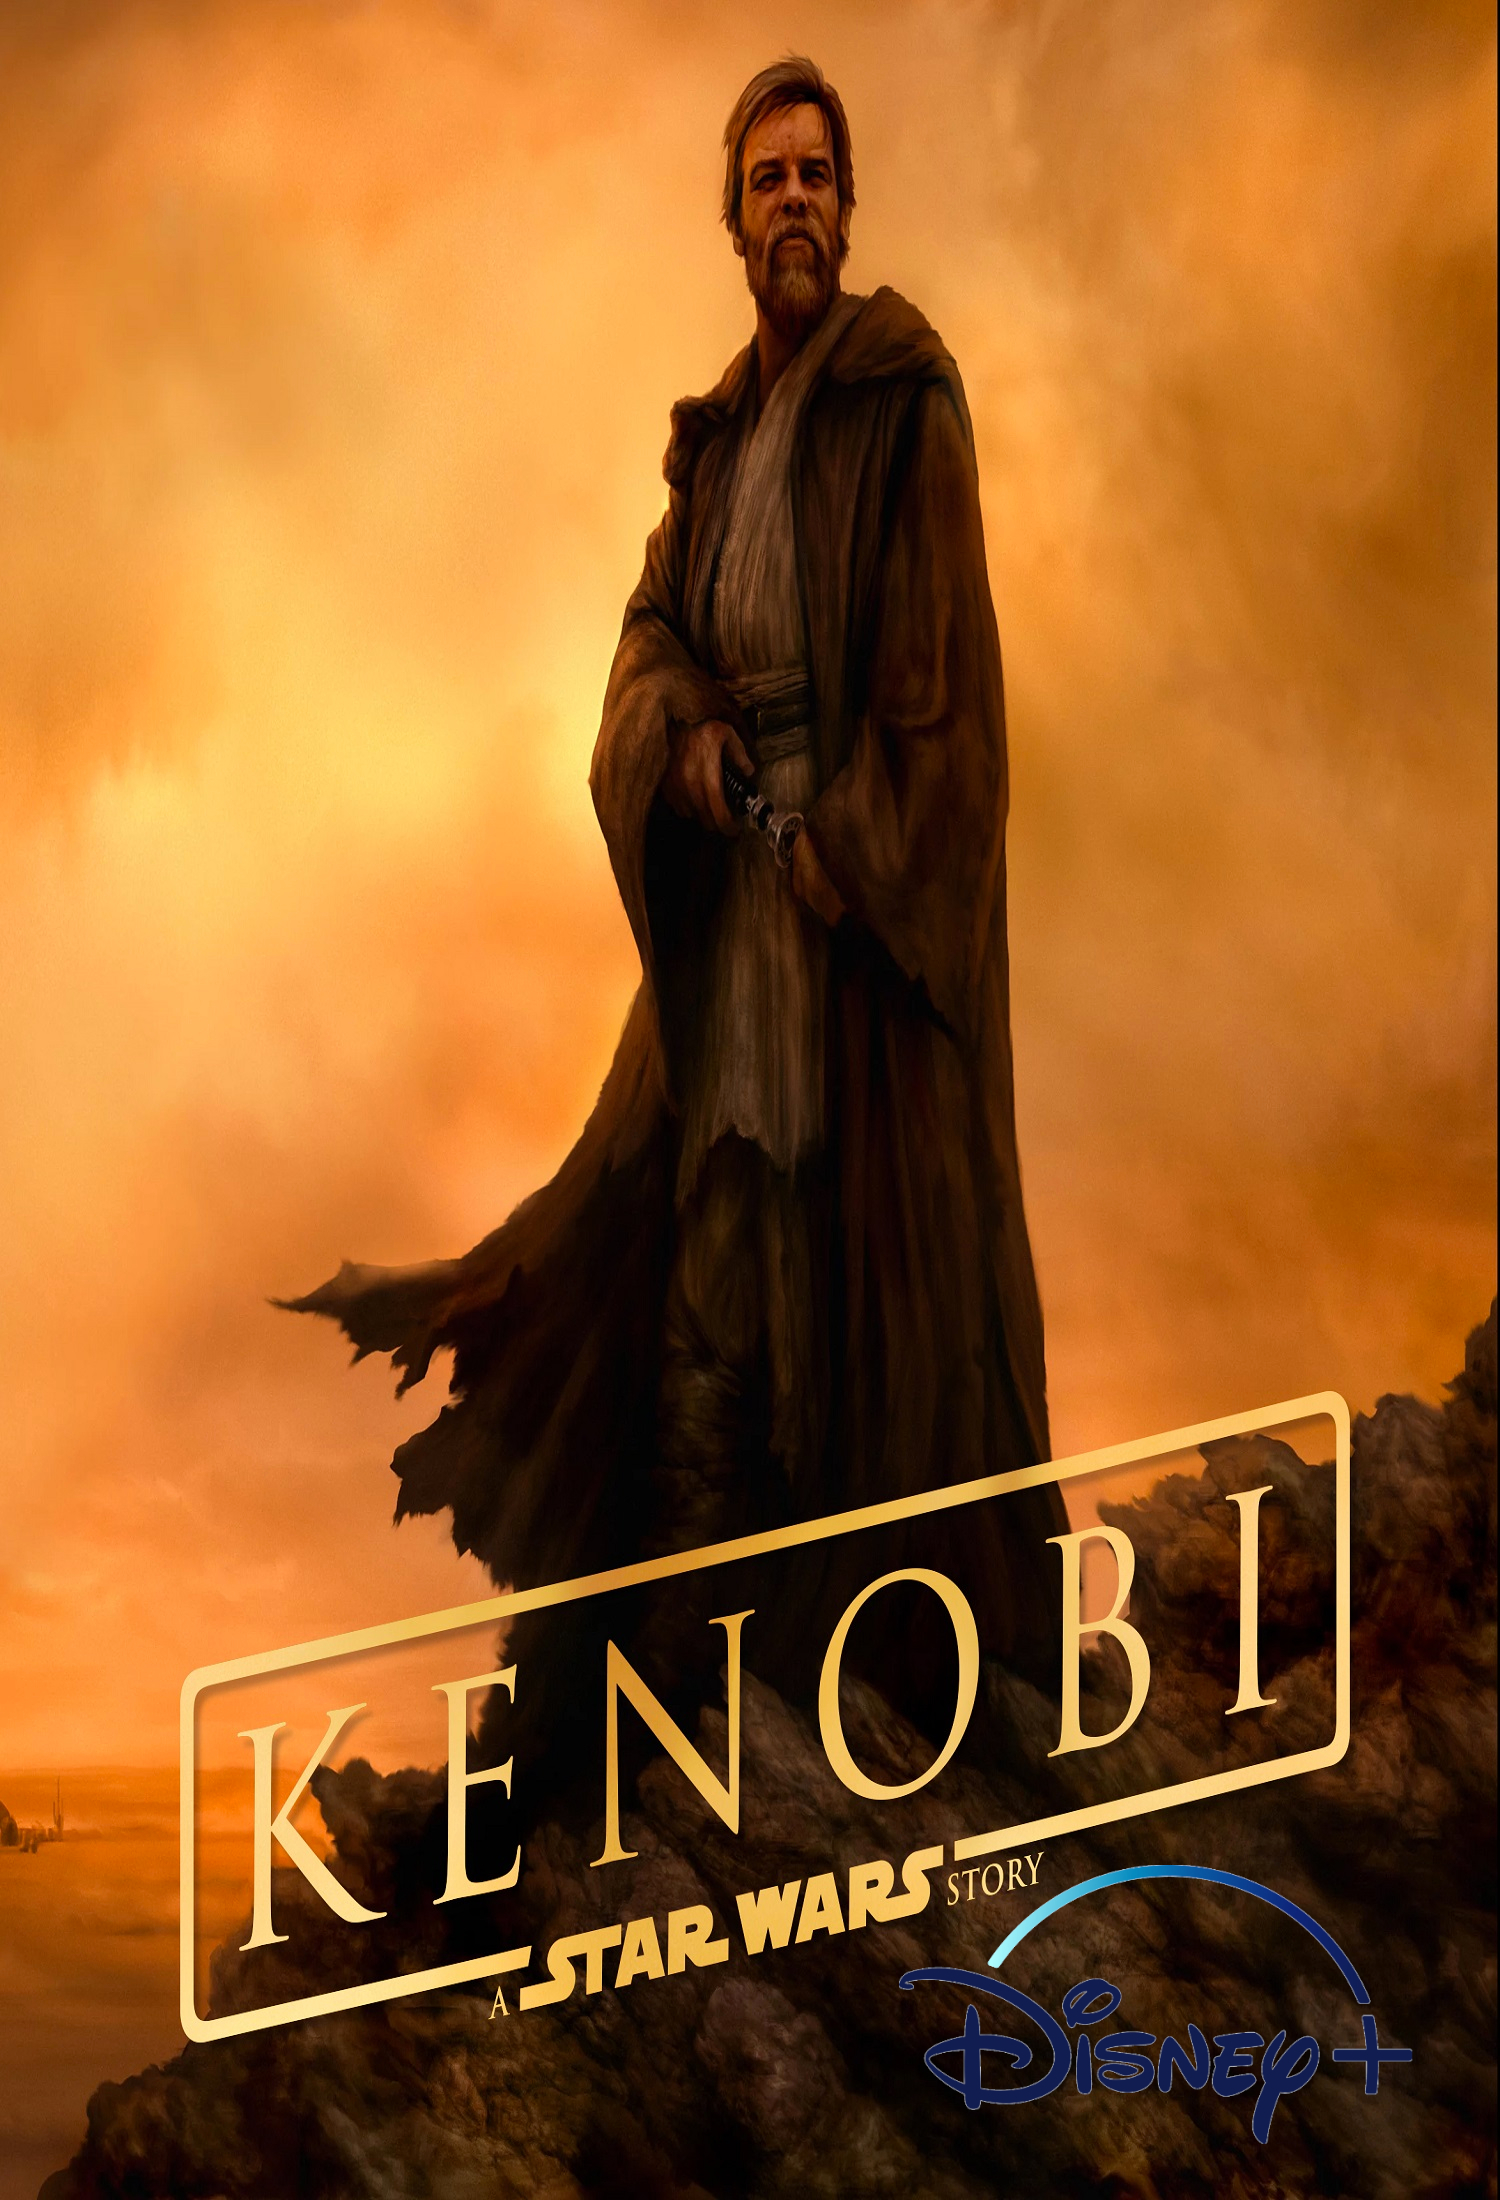 Obi Wan Kenobi Series Coming To Disney Plus Update Confirmed Reggie S Take Com